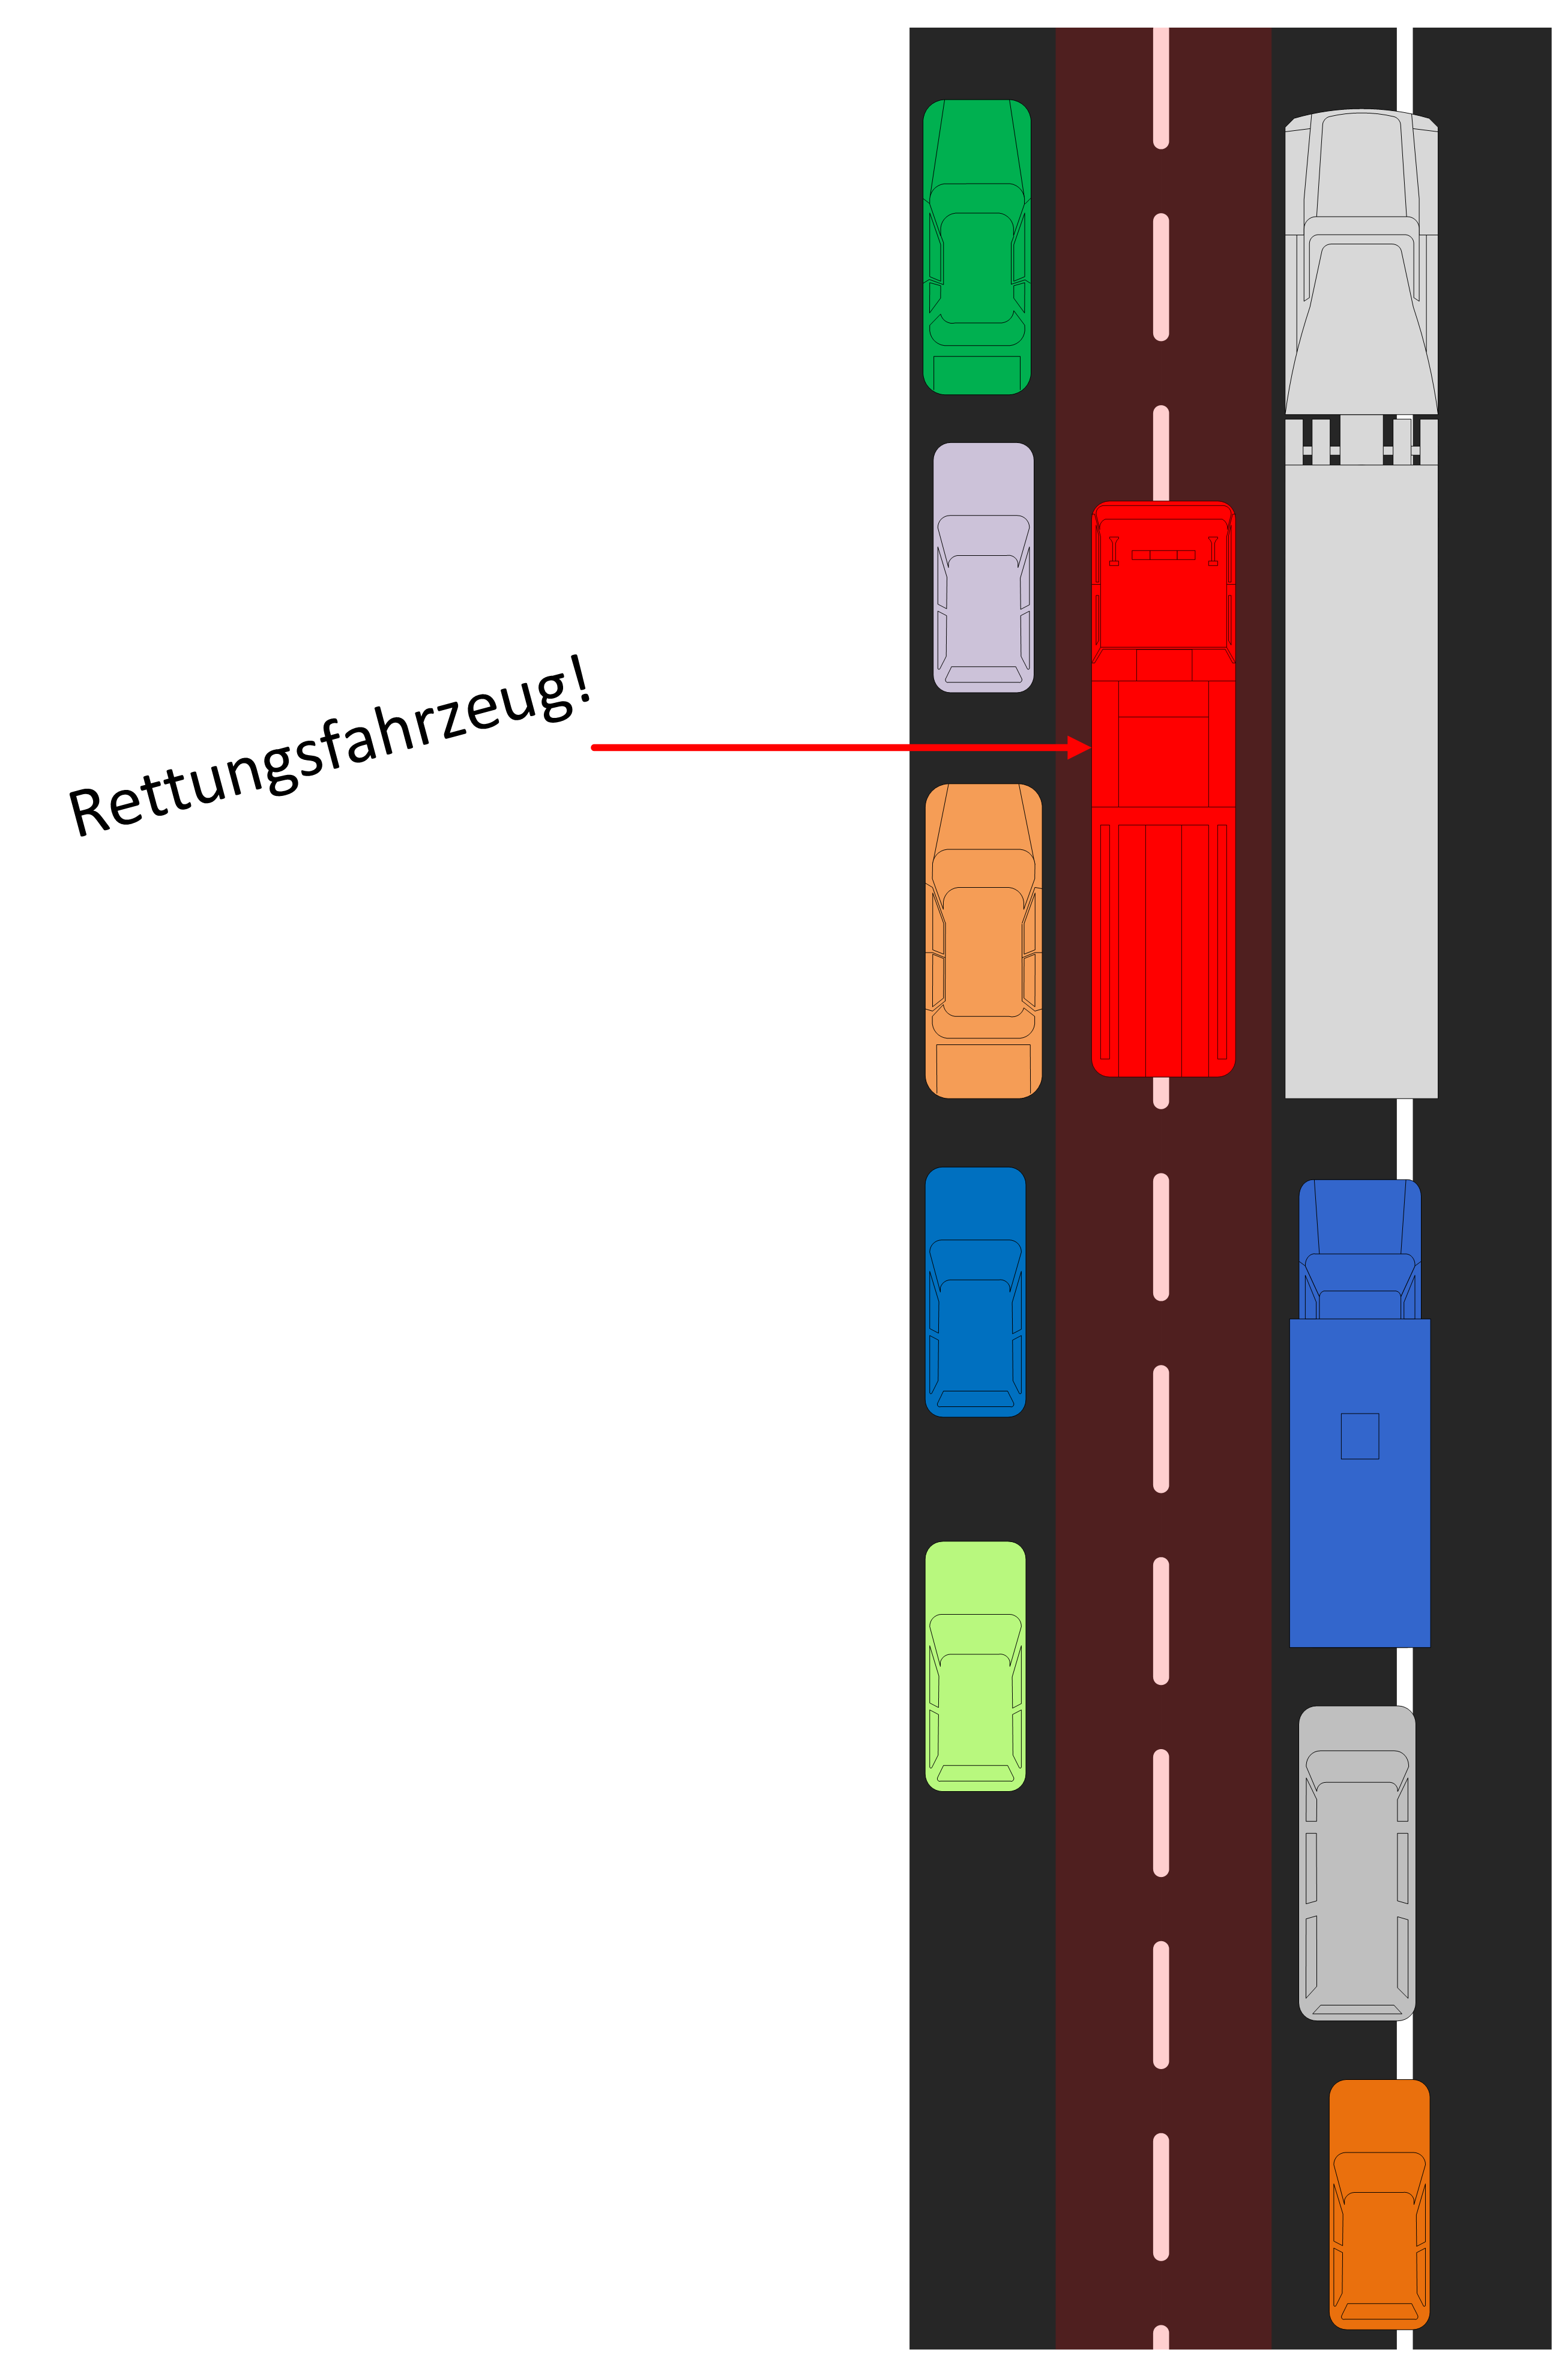 leil.de/di/pics/zweispurige_rettungsgasse_richtig.png